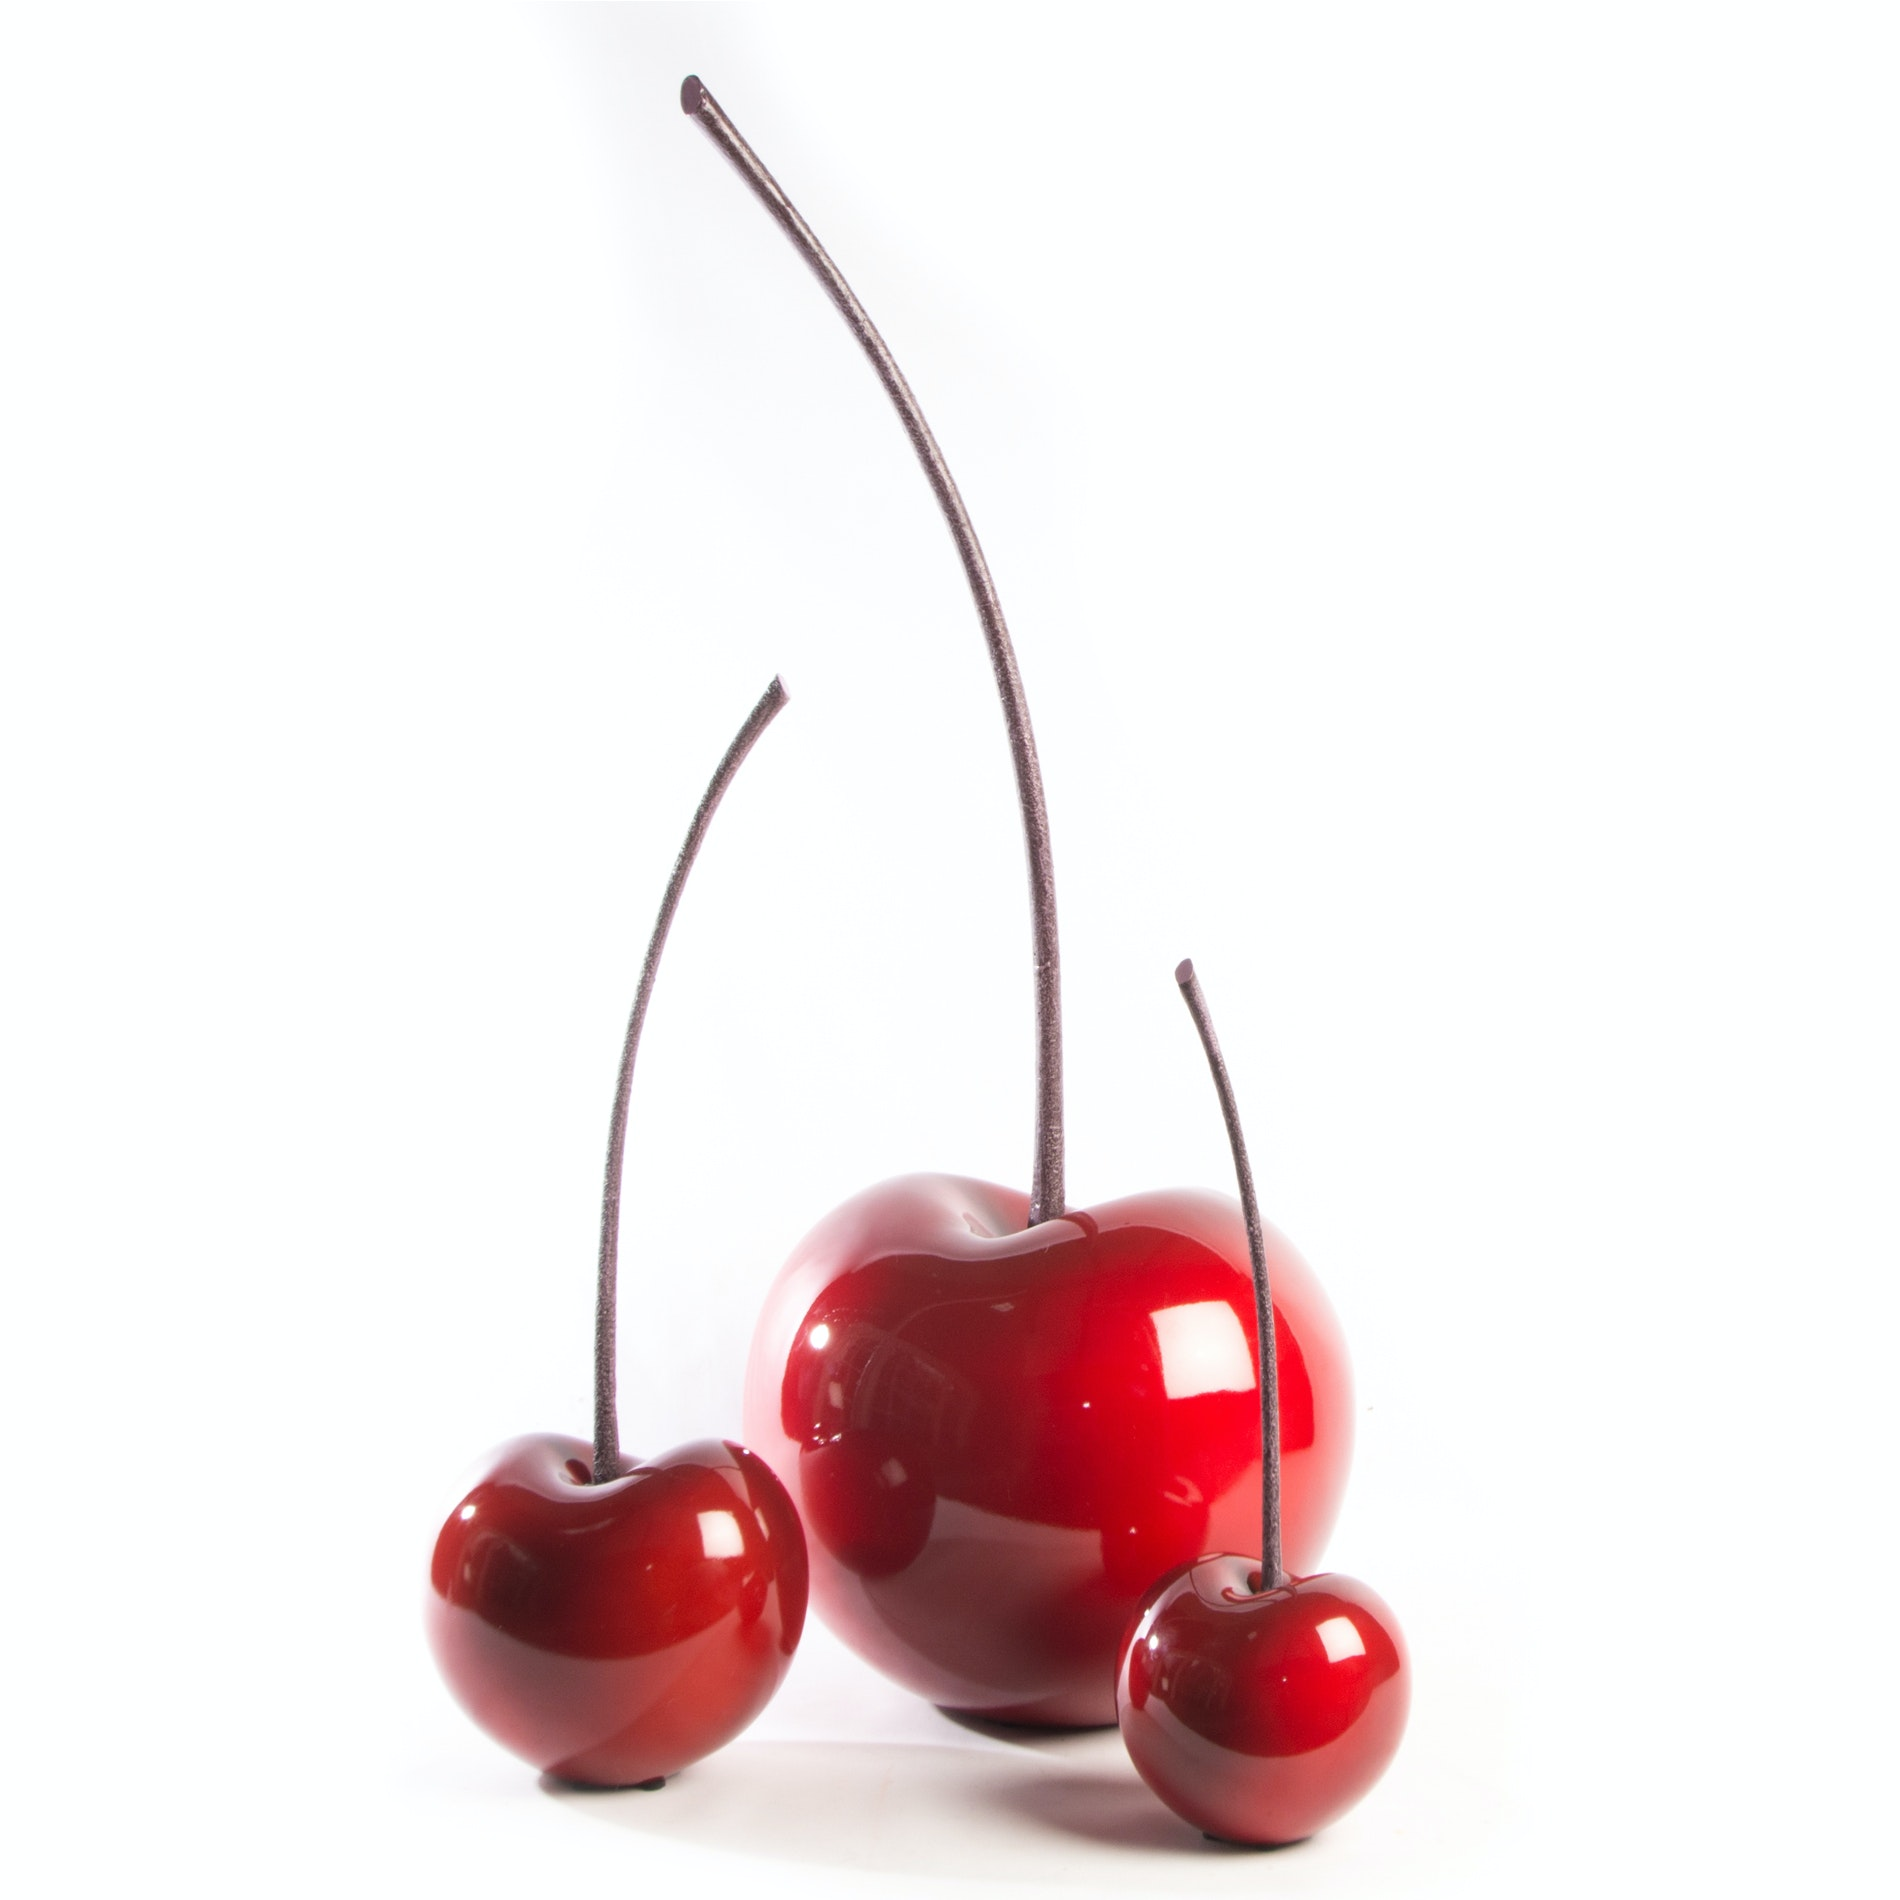 Pop-Art Style Oversized Cherry Decor by Hebi Arts